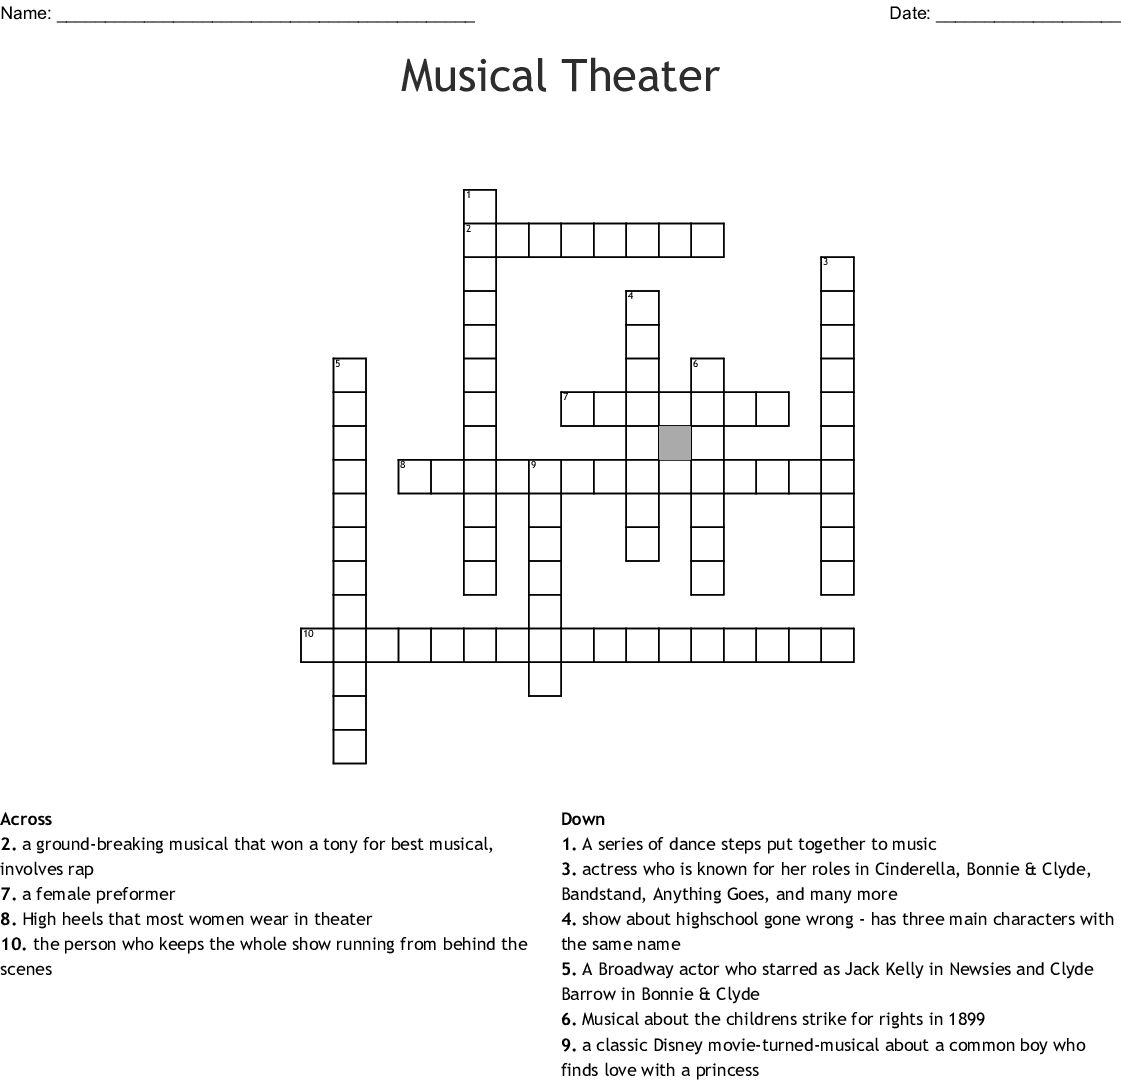 Musical Theater Crossword Wordmint